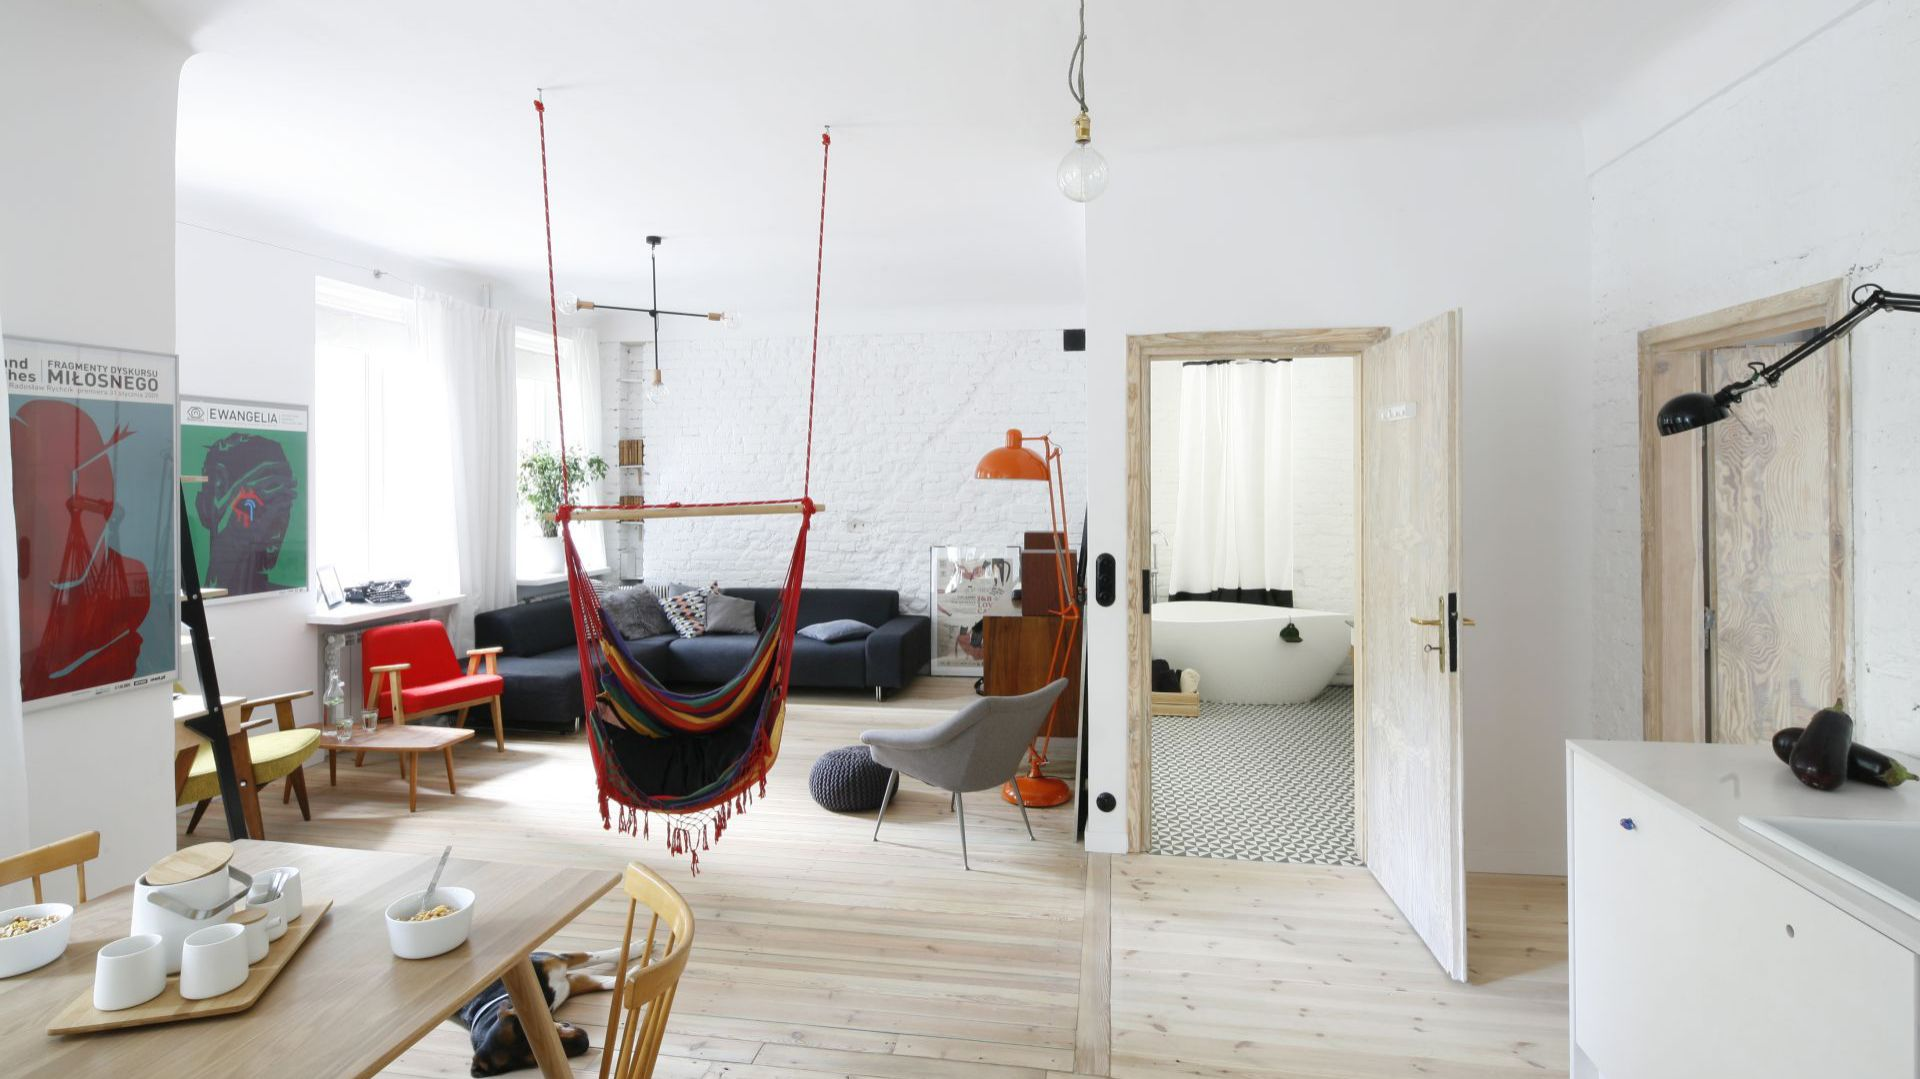 Strefa dzienna: salon, jadalnia i kuchnia. Projekt: arch. wnętrz Ewelina Pik, Modullar. Fot. Bartosz Jarosz